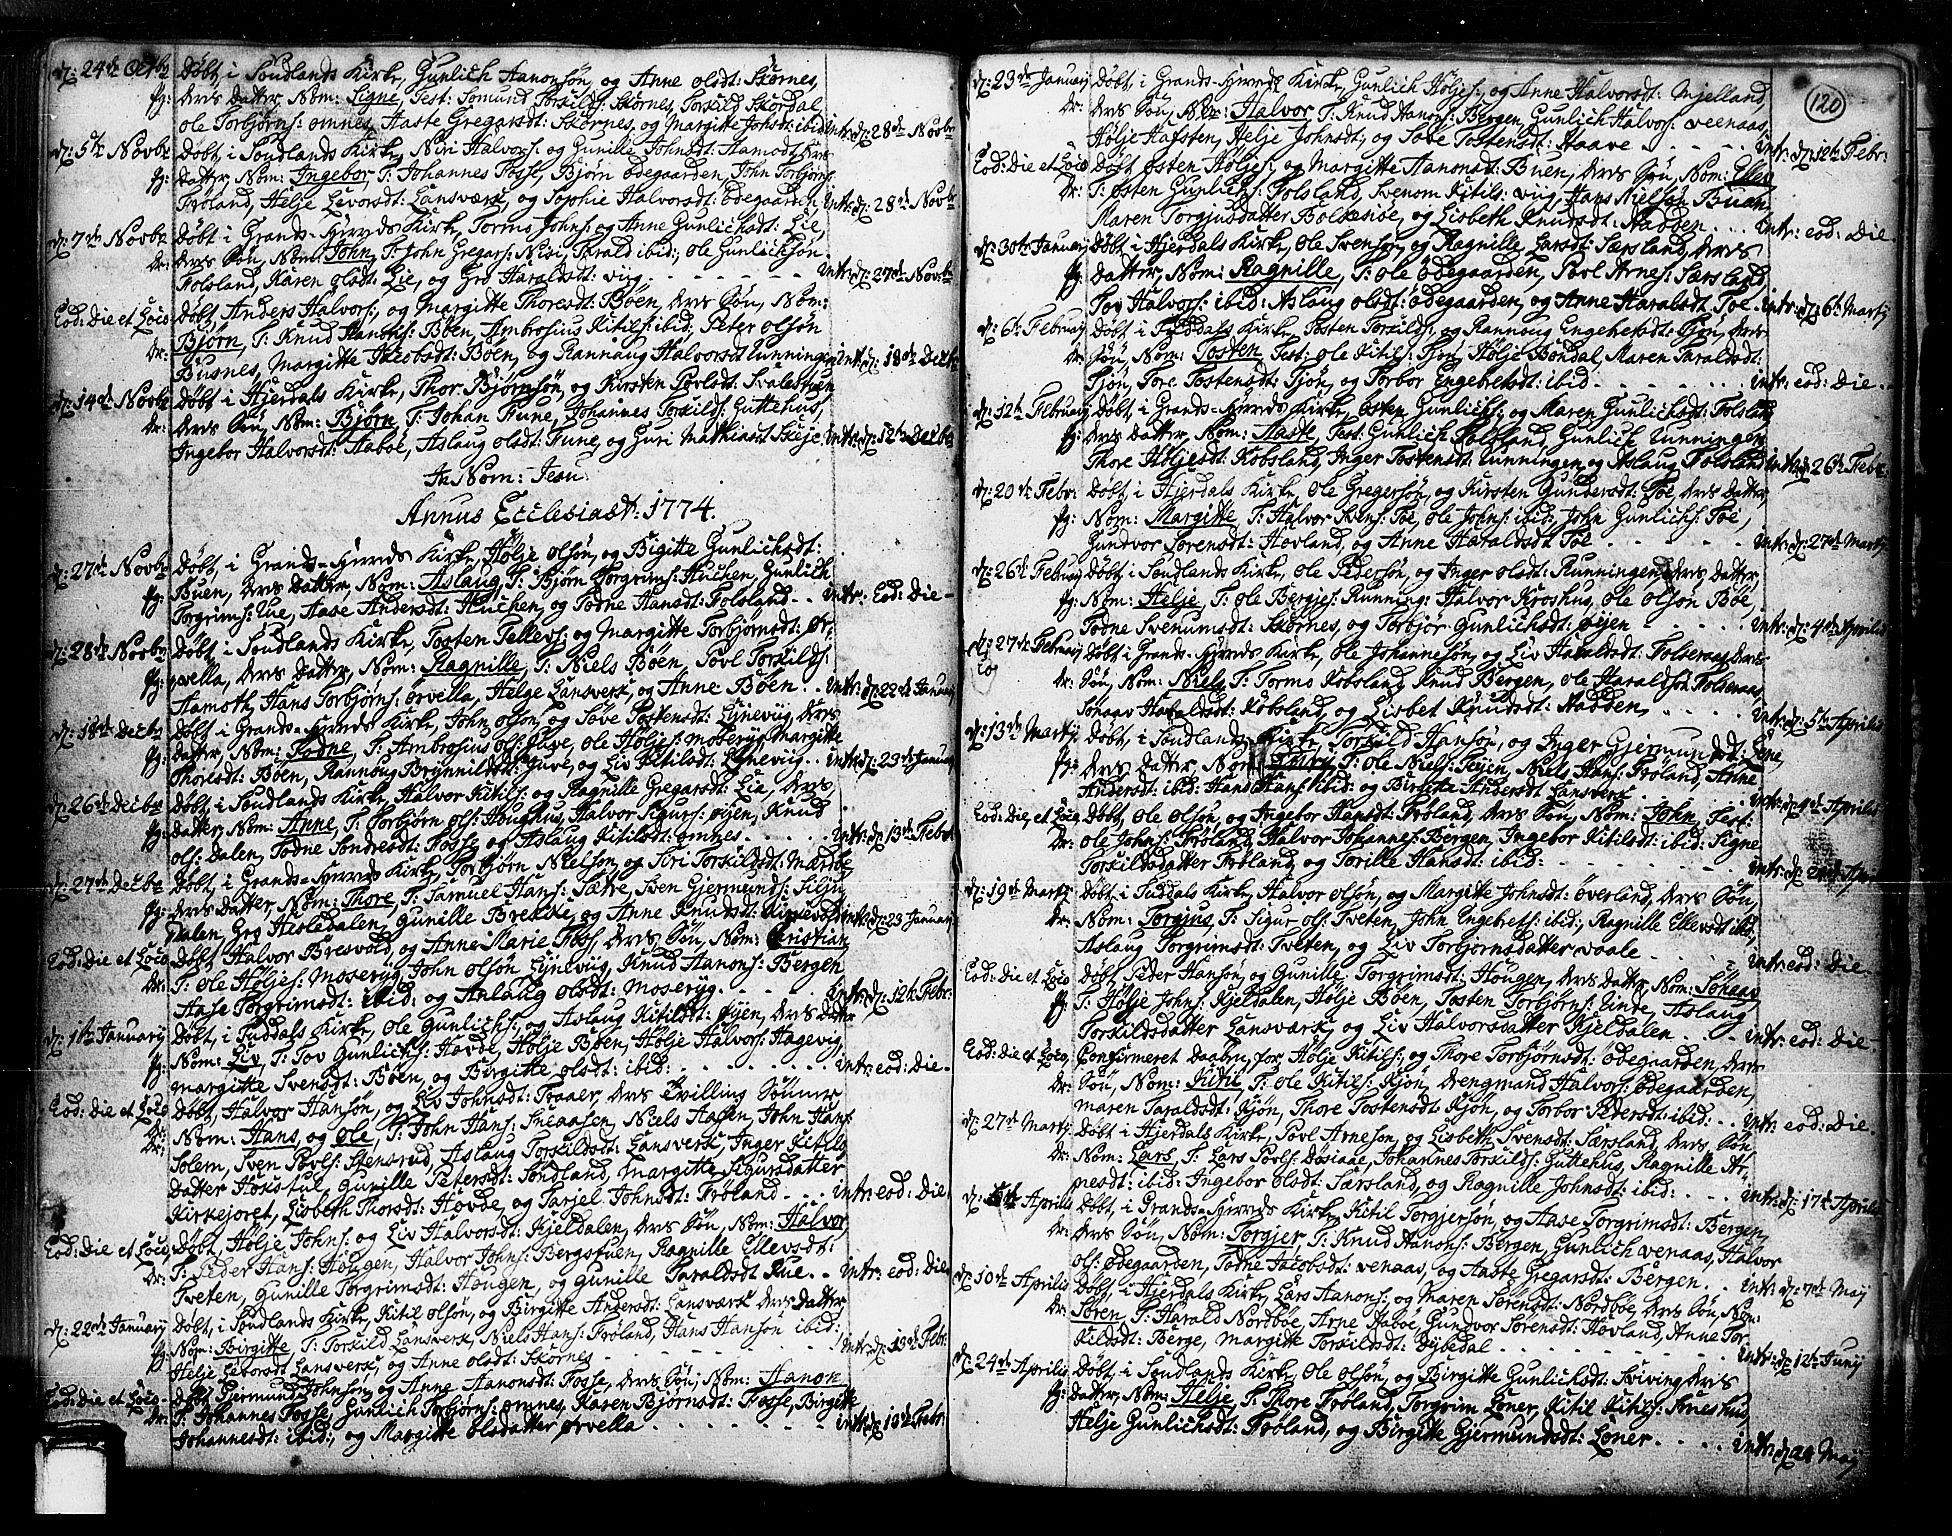 SAKO, Hjartdal kirkebøker, F/Fa/L0003: Ministerialbok nr. I 3, 1727-1775, s. 120